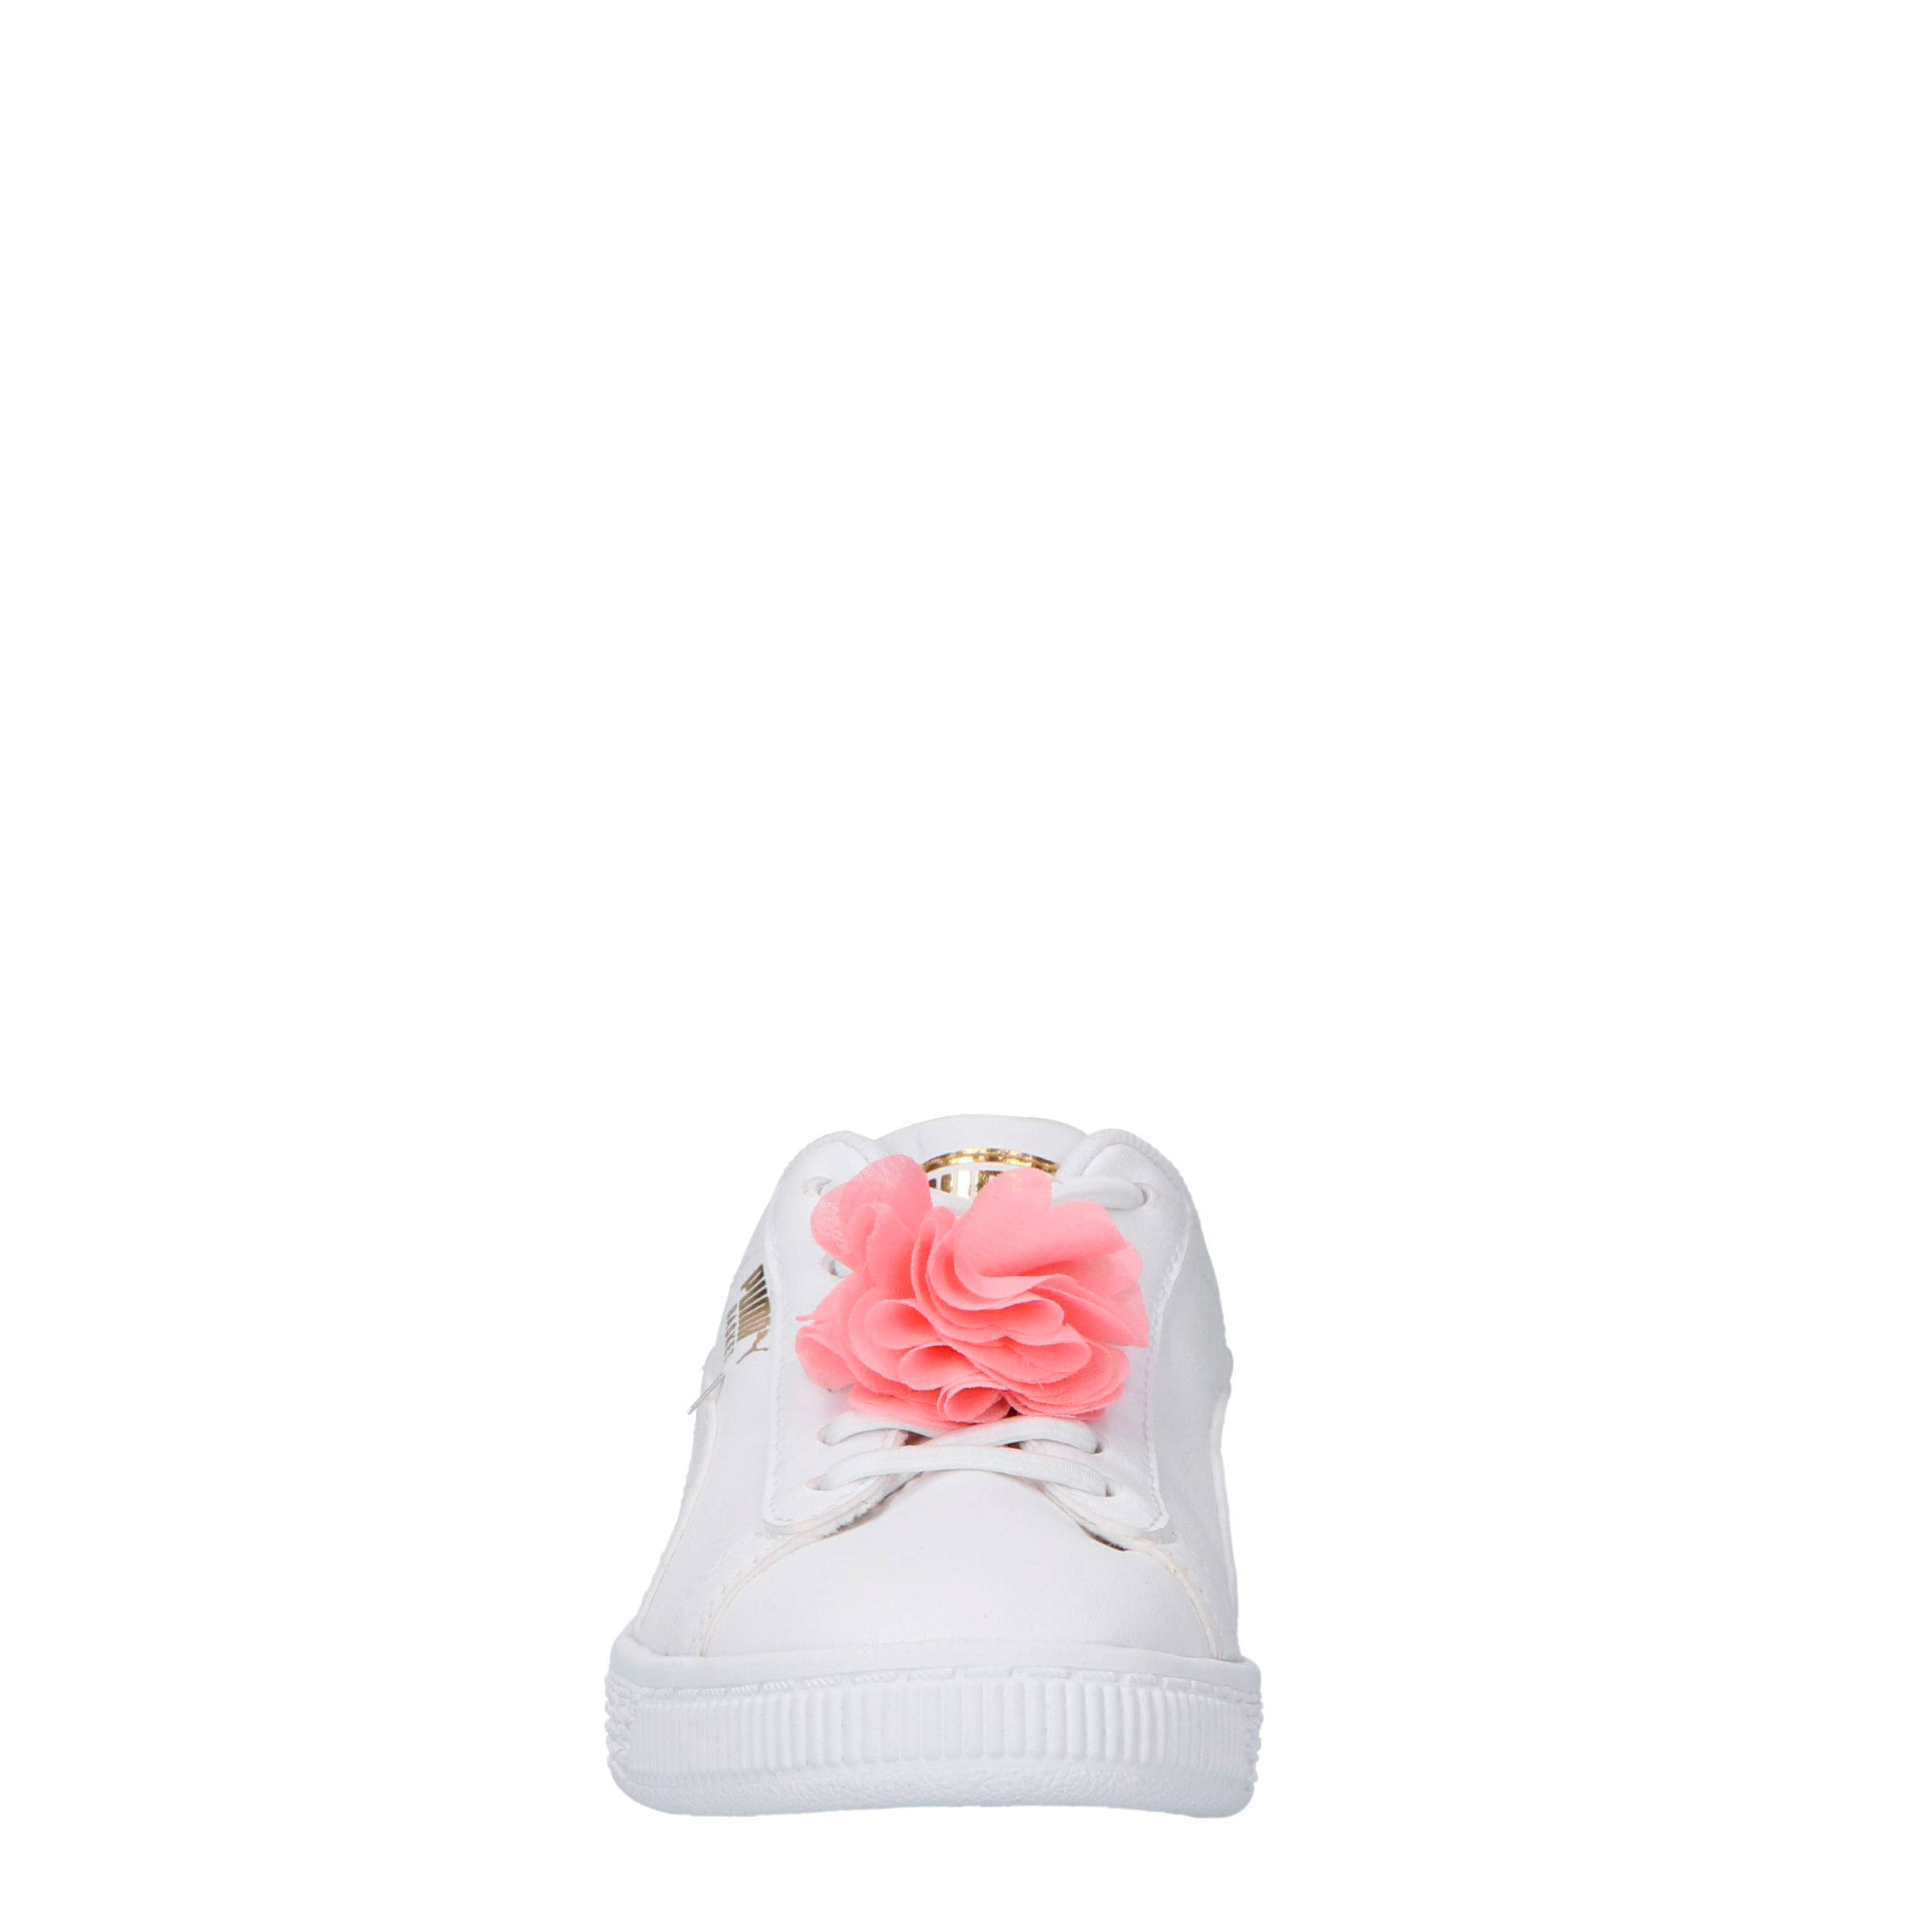 e9e8cbf93c4 Puma Basket Flower AC PS sneakers wit | wehkamp